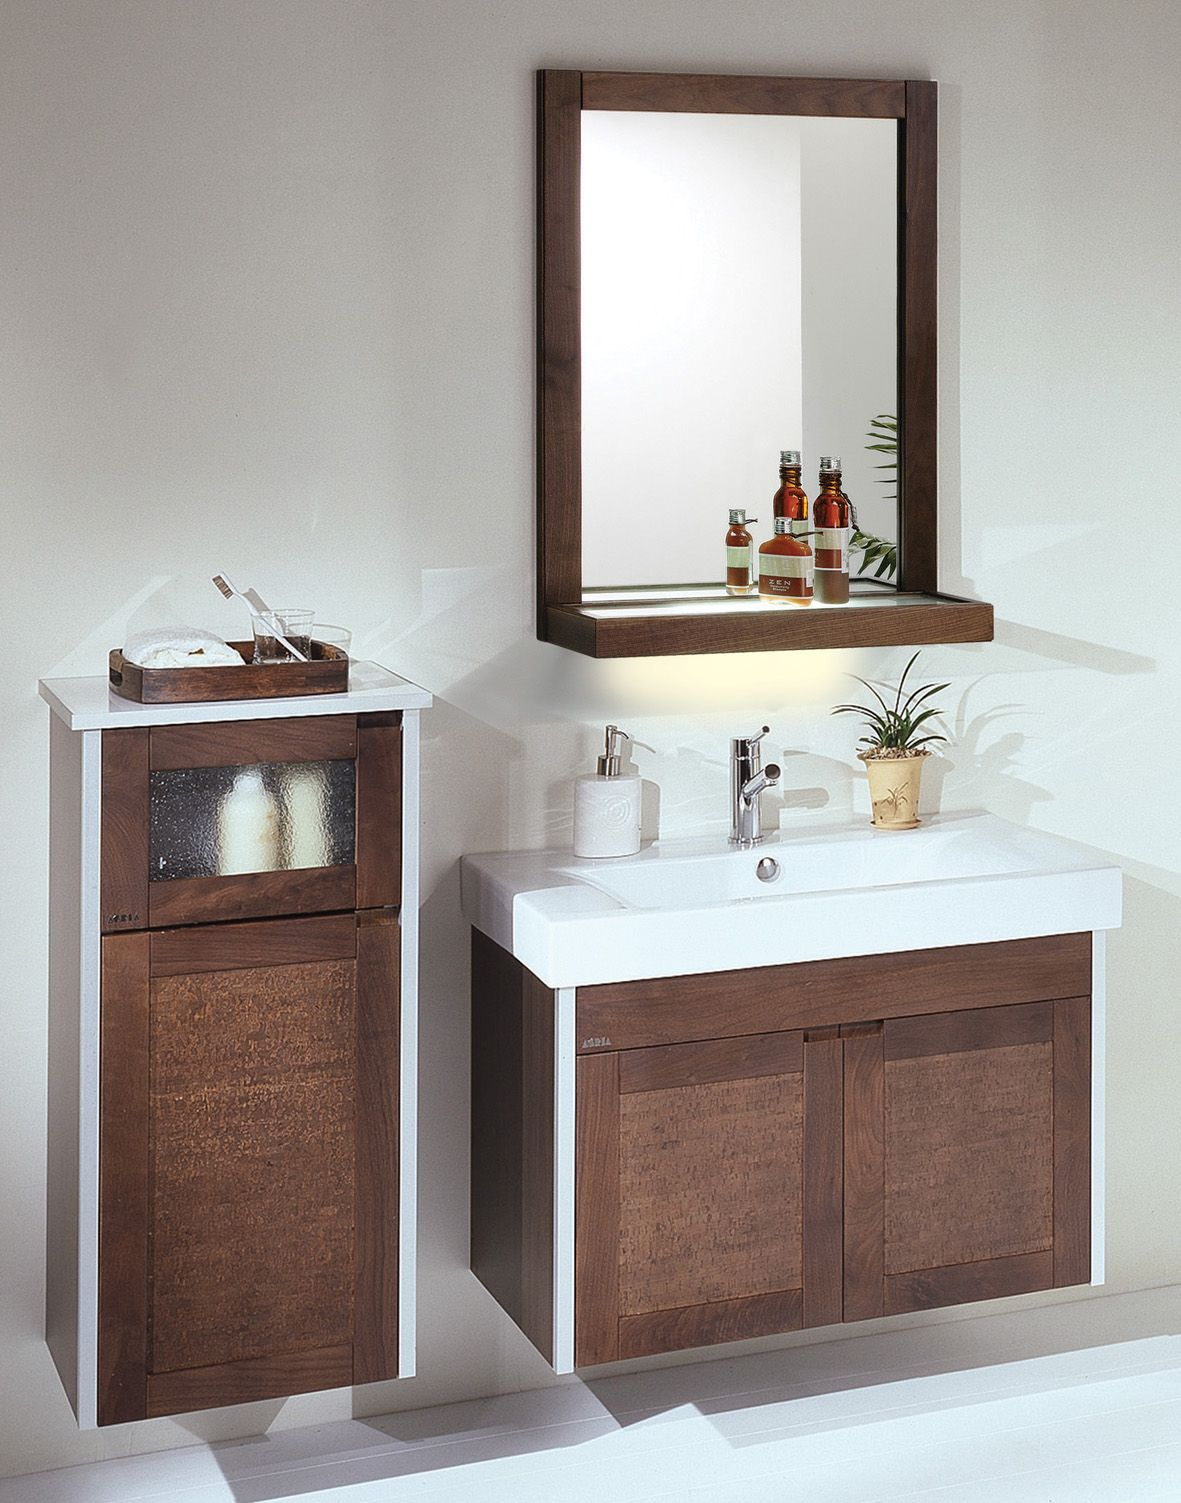 bathroom sink cabinets white | Stribal.com | Design Interior Home ...